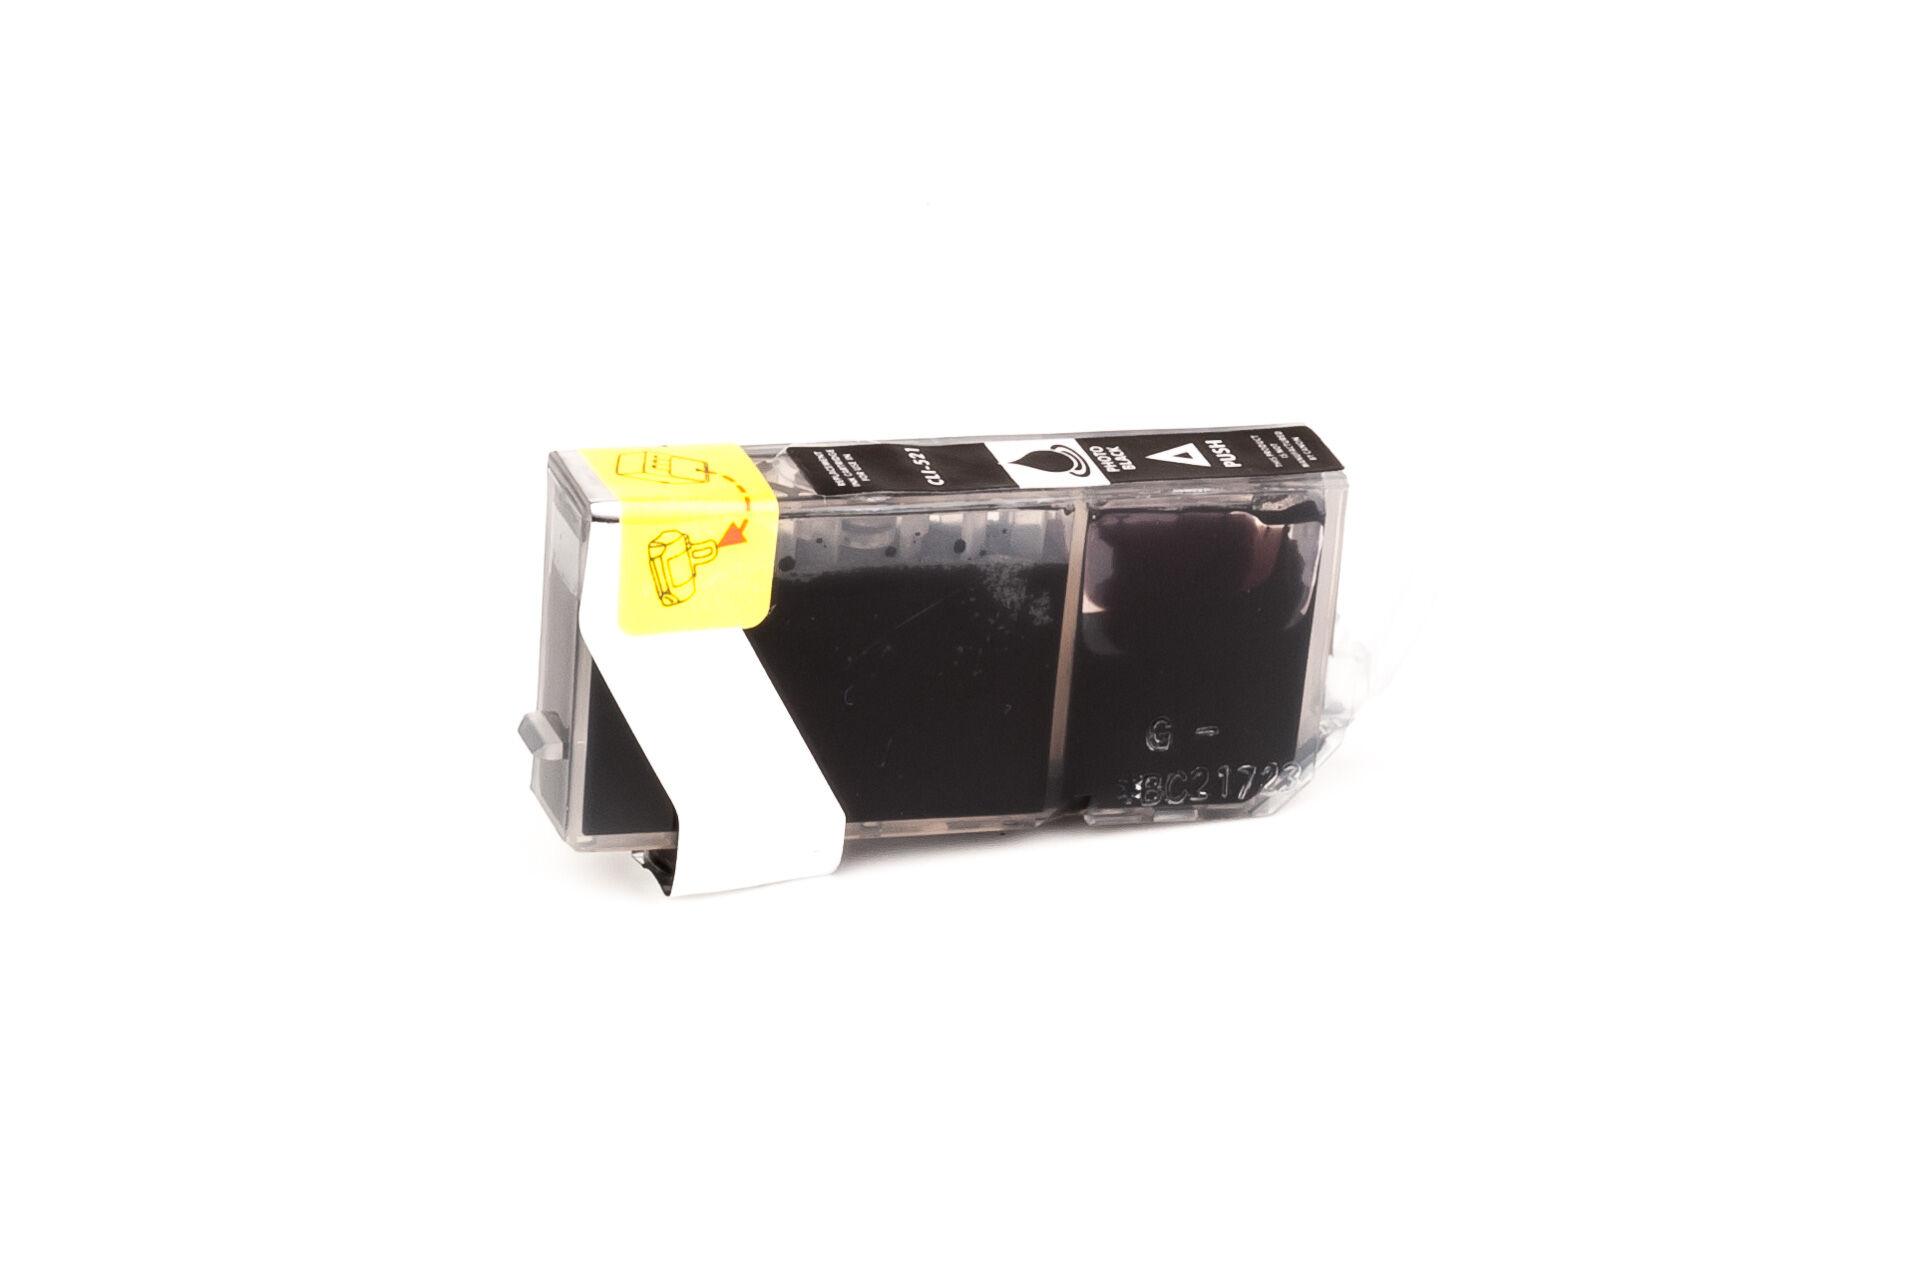 Canon Cartouche d'encre pour Canon 2933B001 / CLI-521 BK noir photo compatible (de marque ASC)